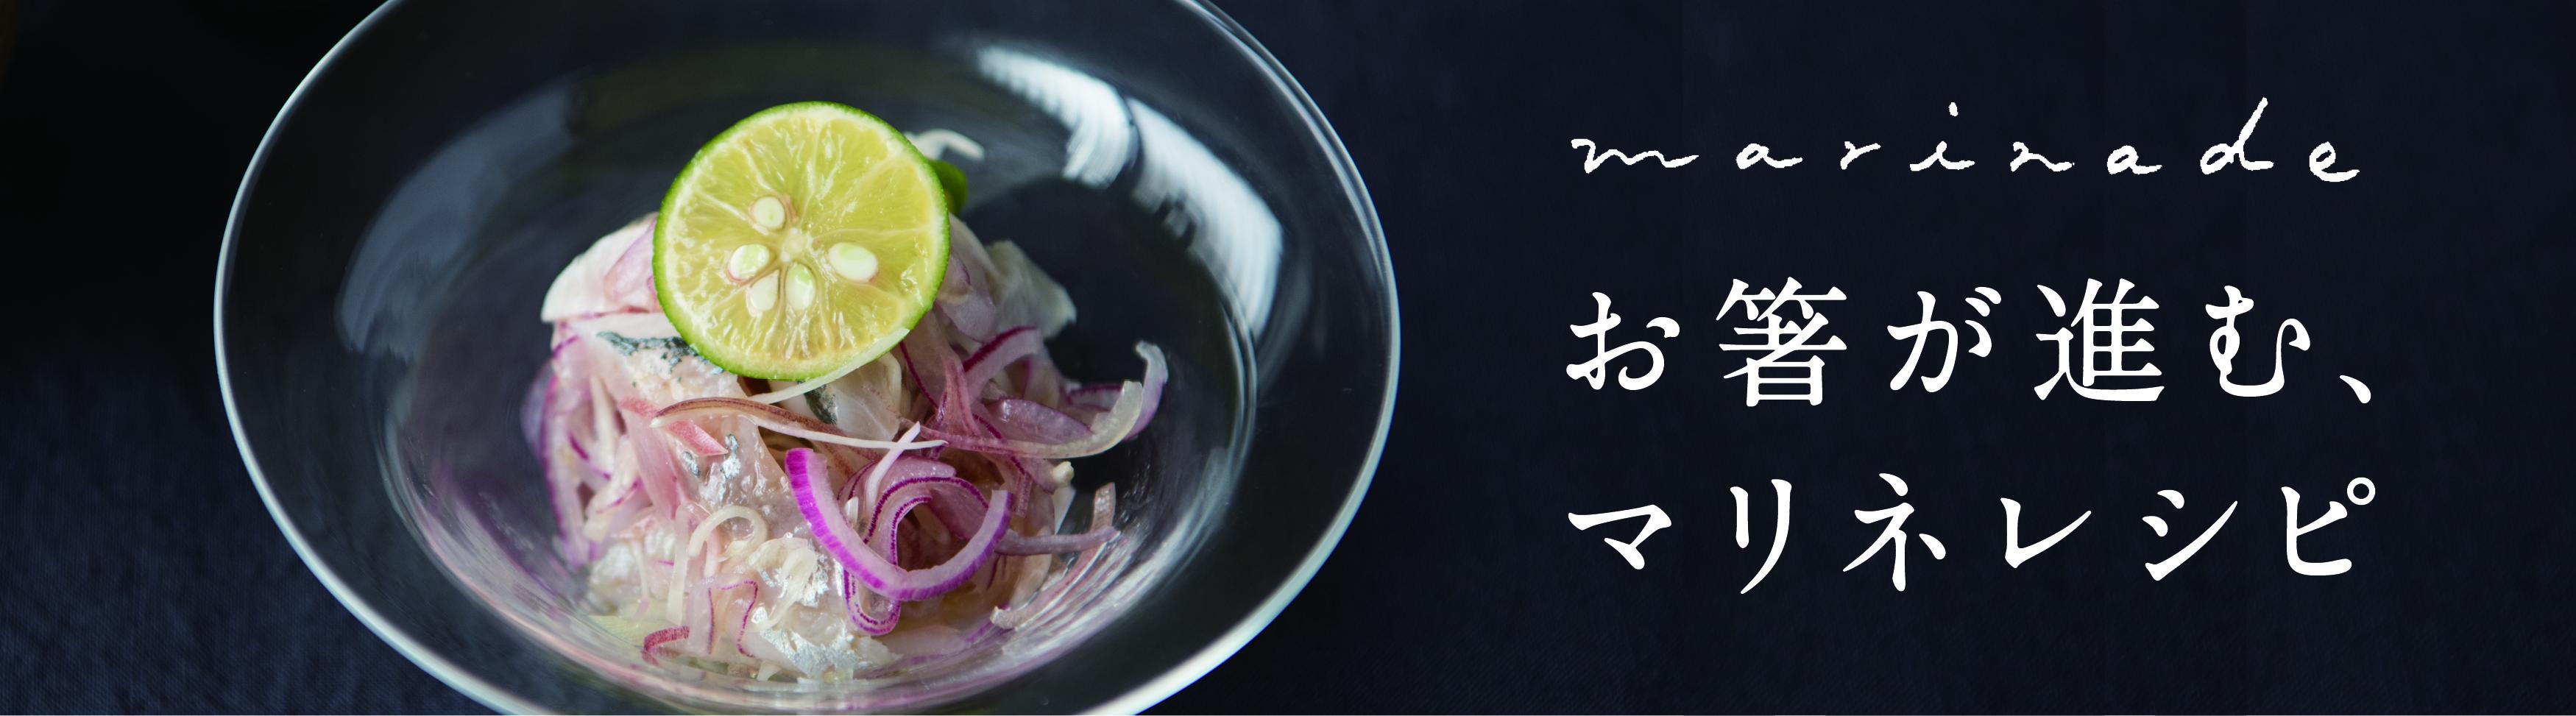 Kurashi厳選!料理家さんに教わったマリネ特集10選